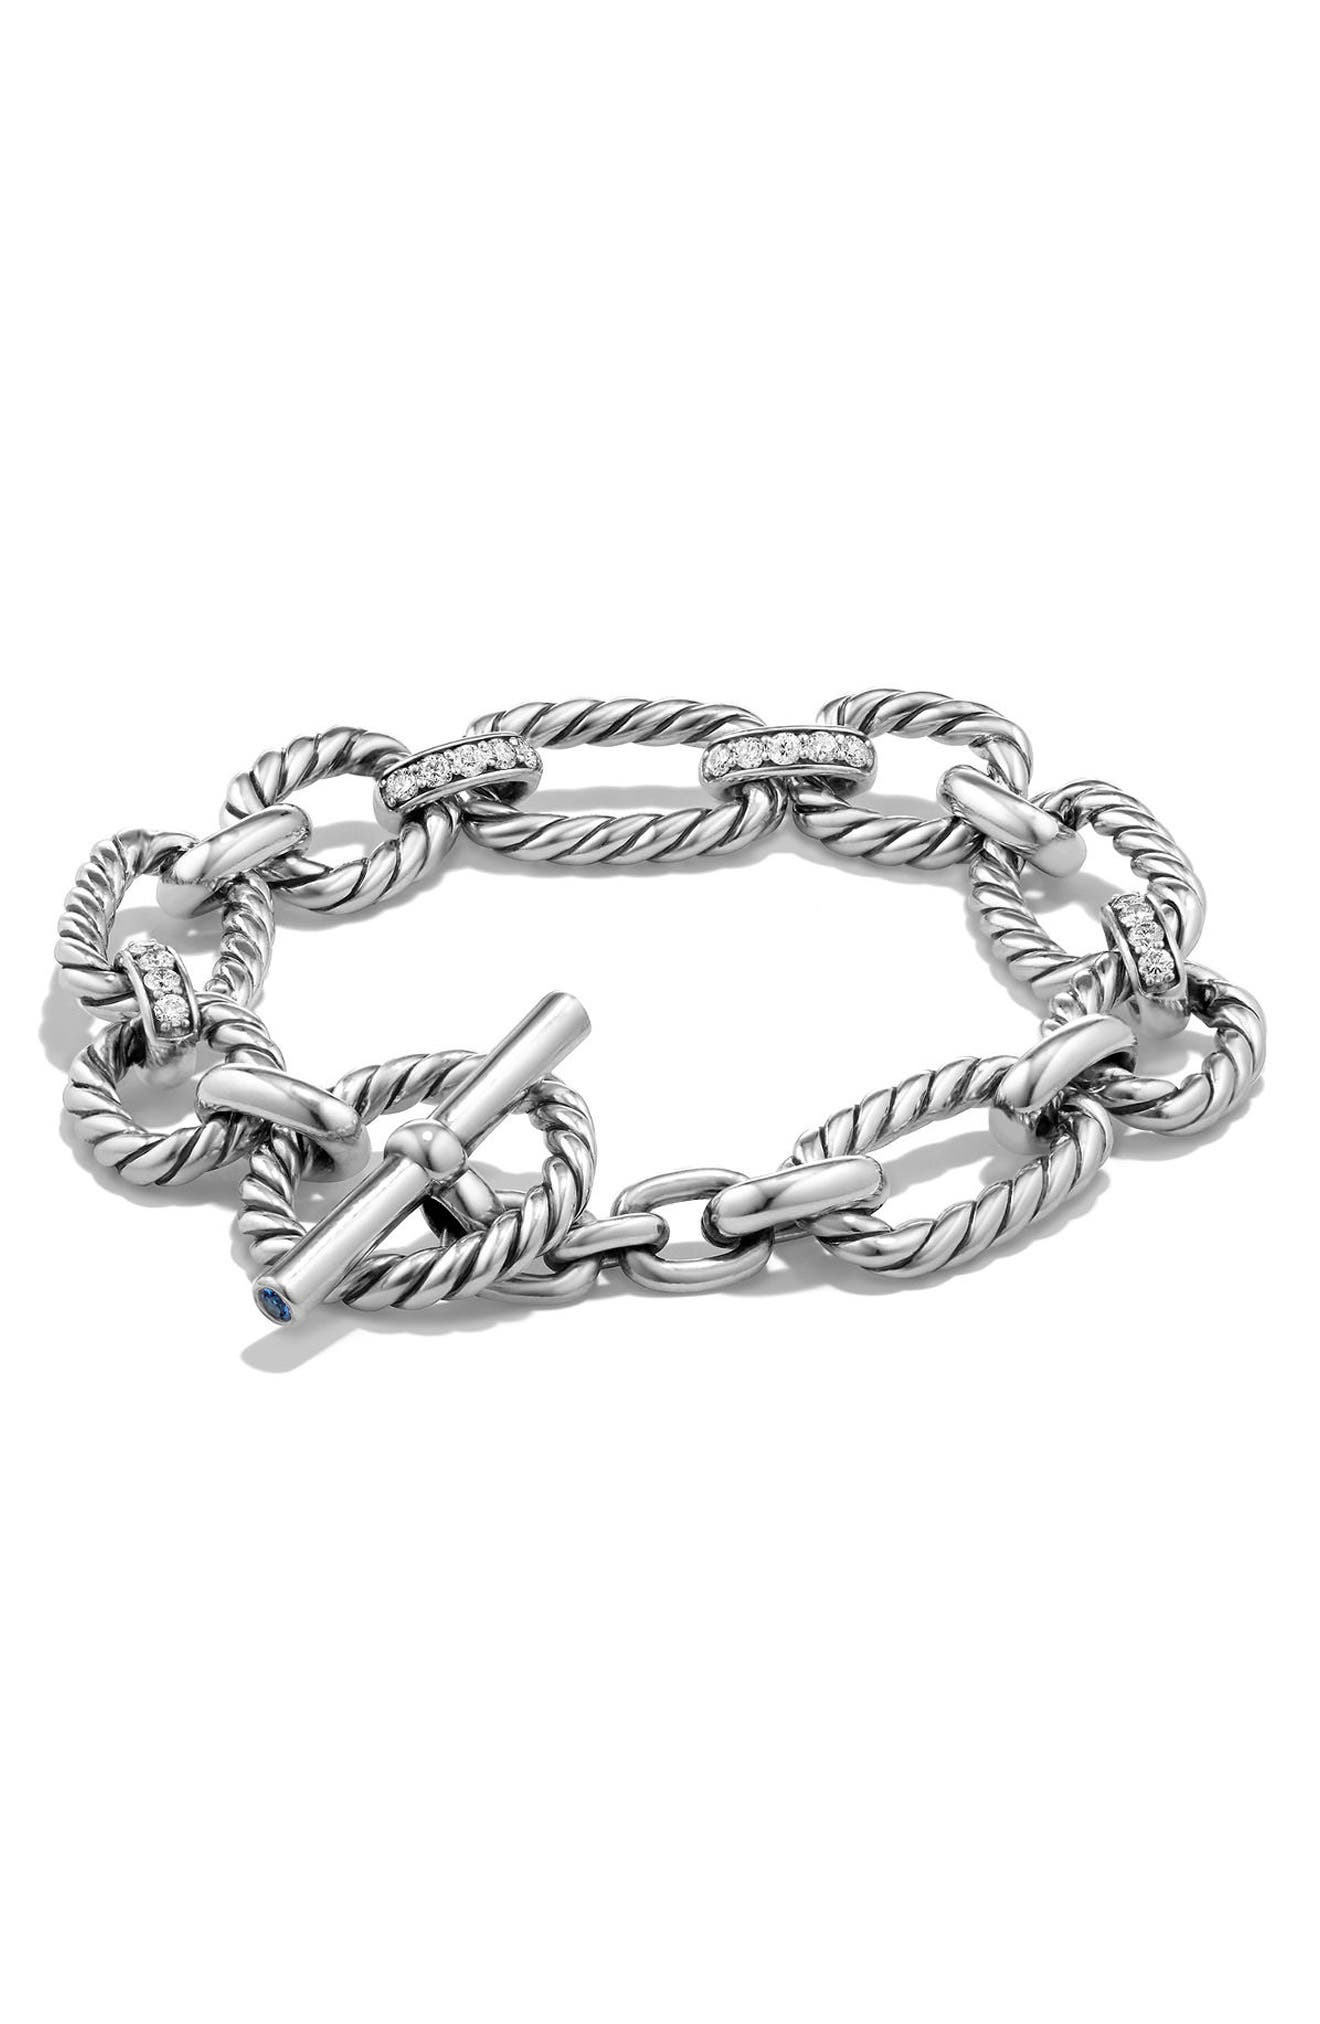 David Yurman 'Chain' Cushion Link Bracelet with Diamonds